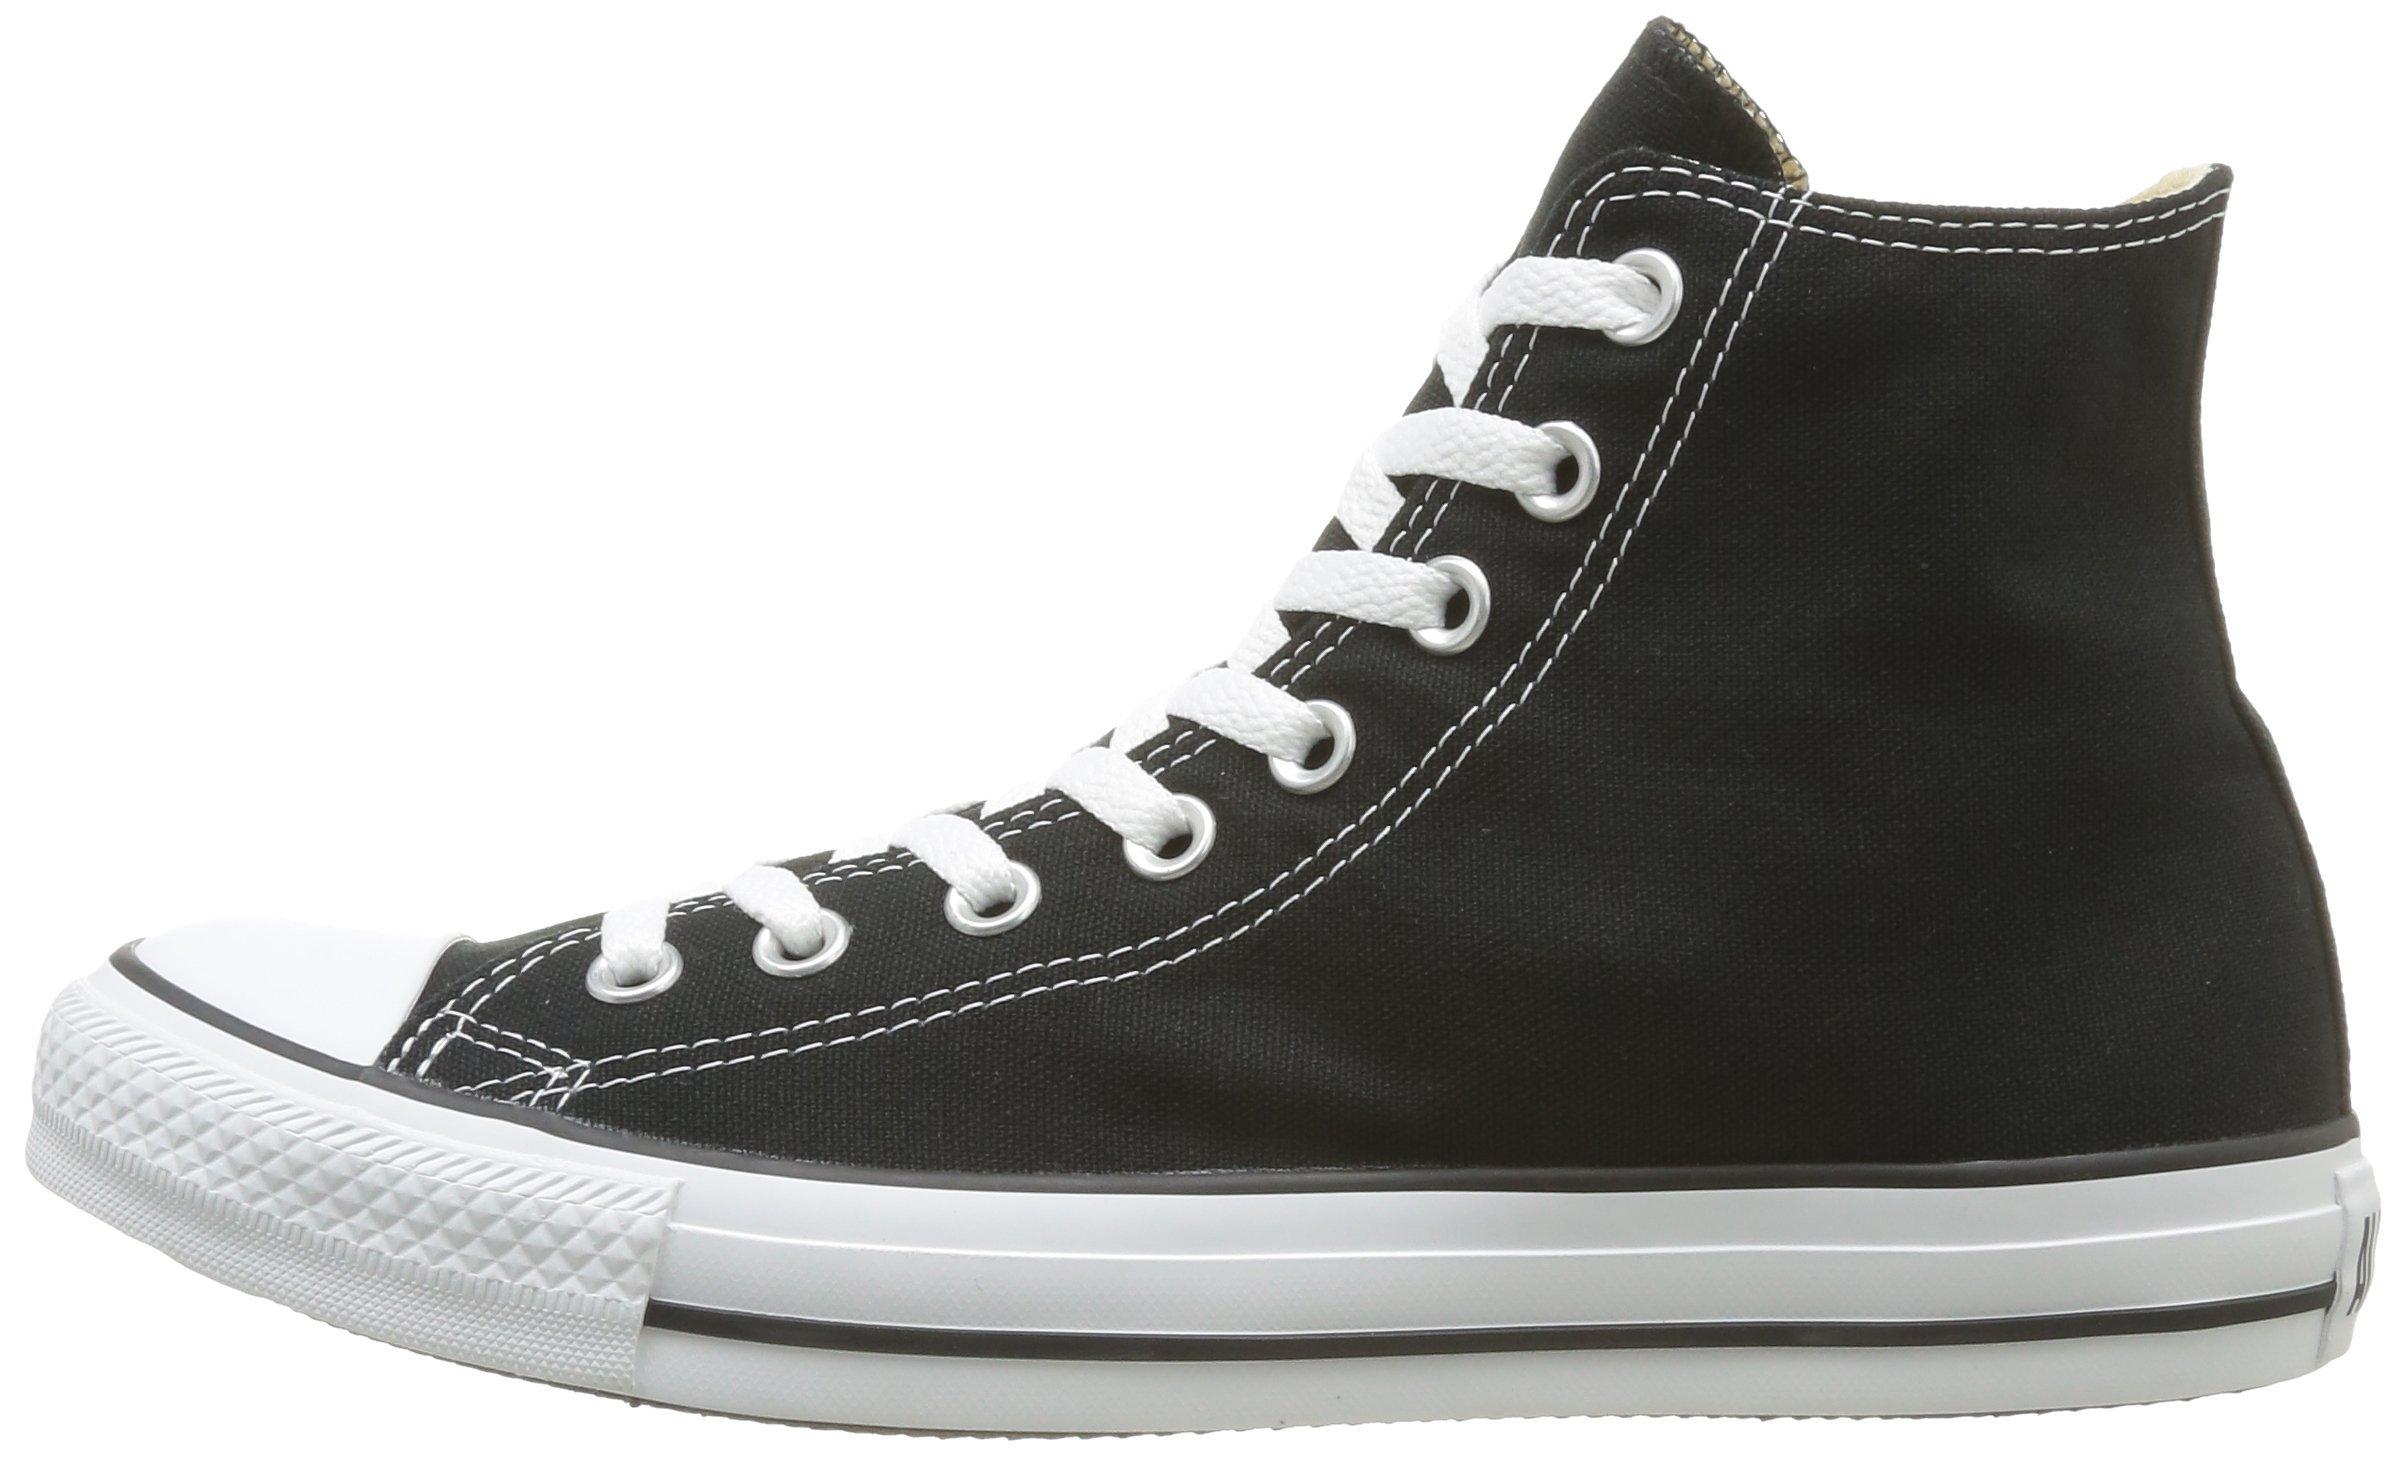 Converse Chuck Taylor All Star Canvas High Top Sneaker Black/White 8 M US Women / 6 M US Men